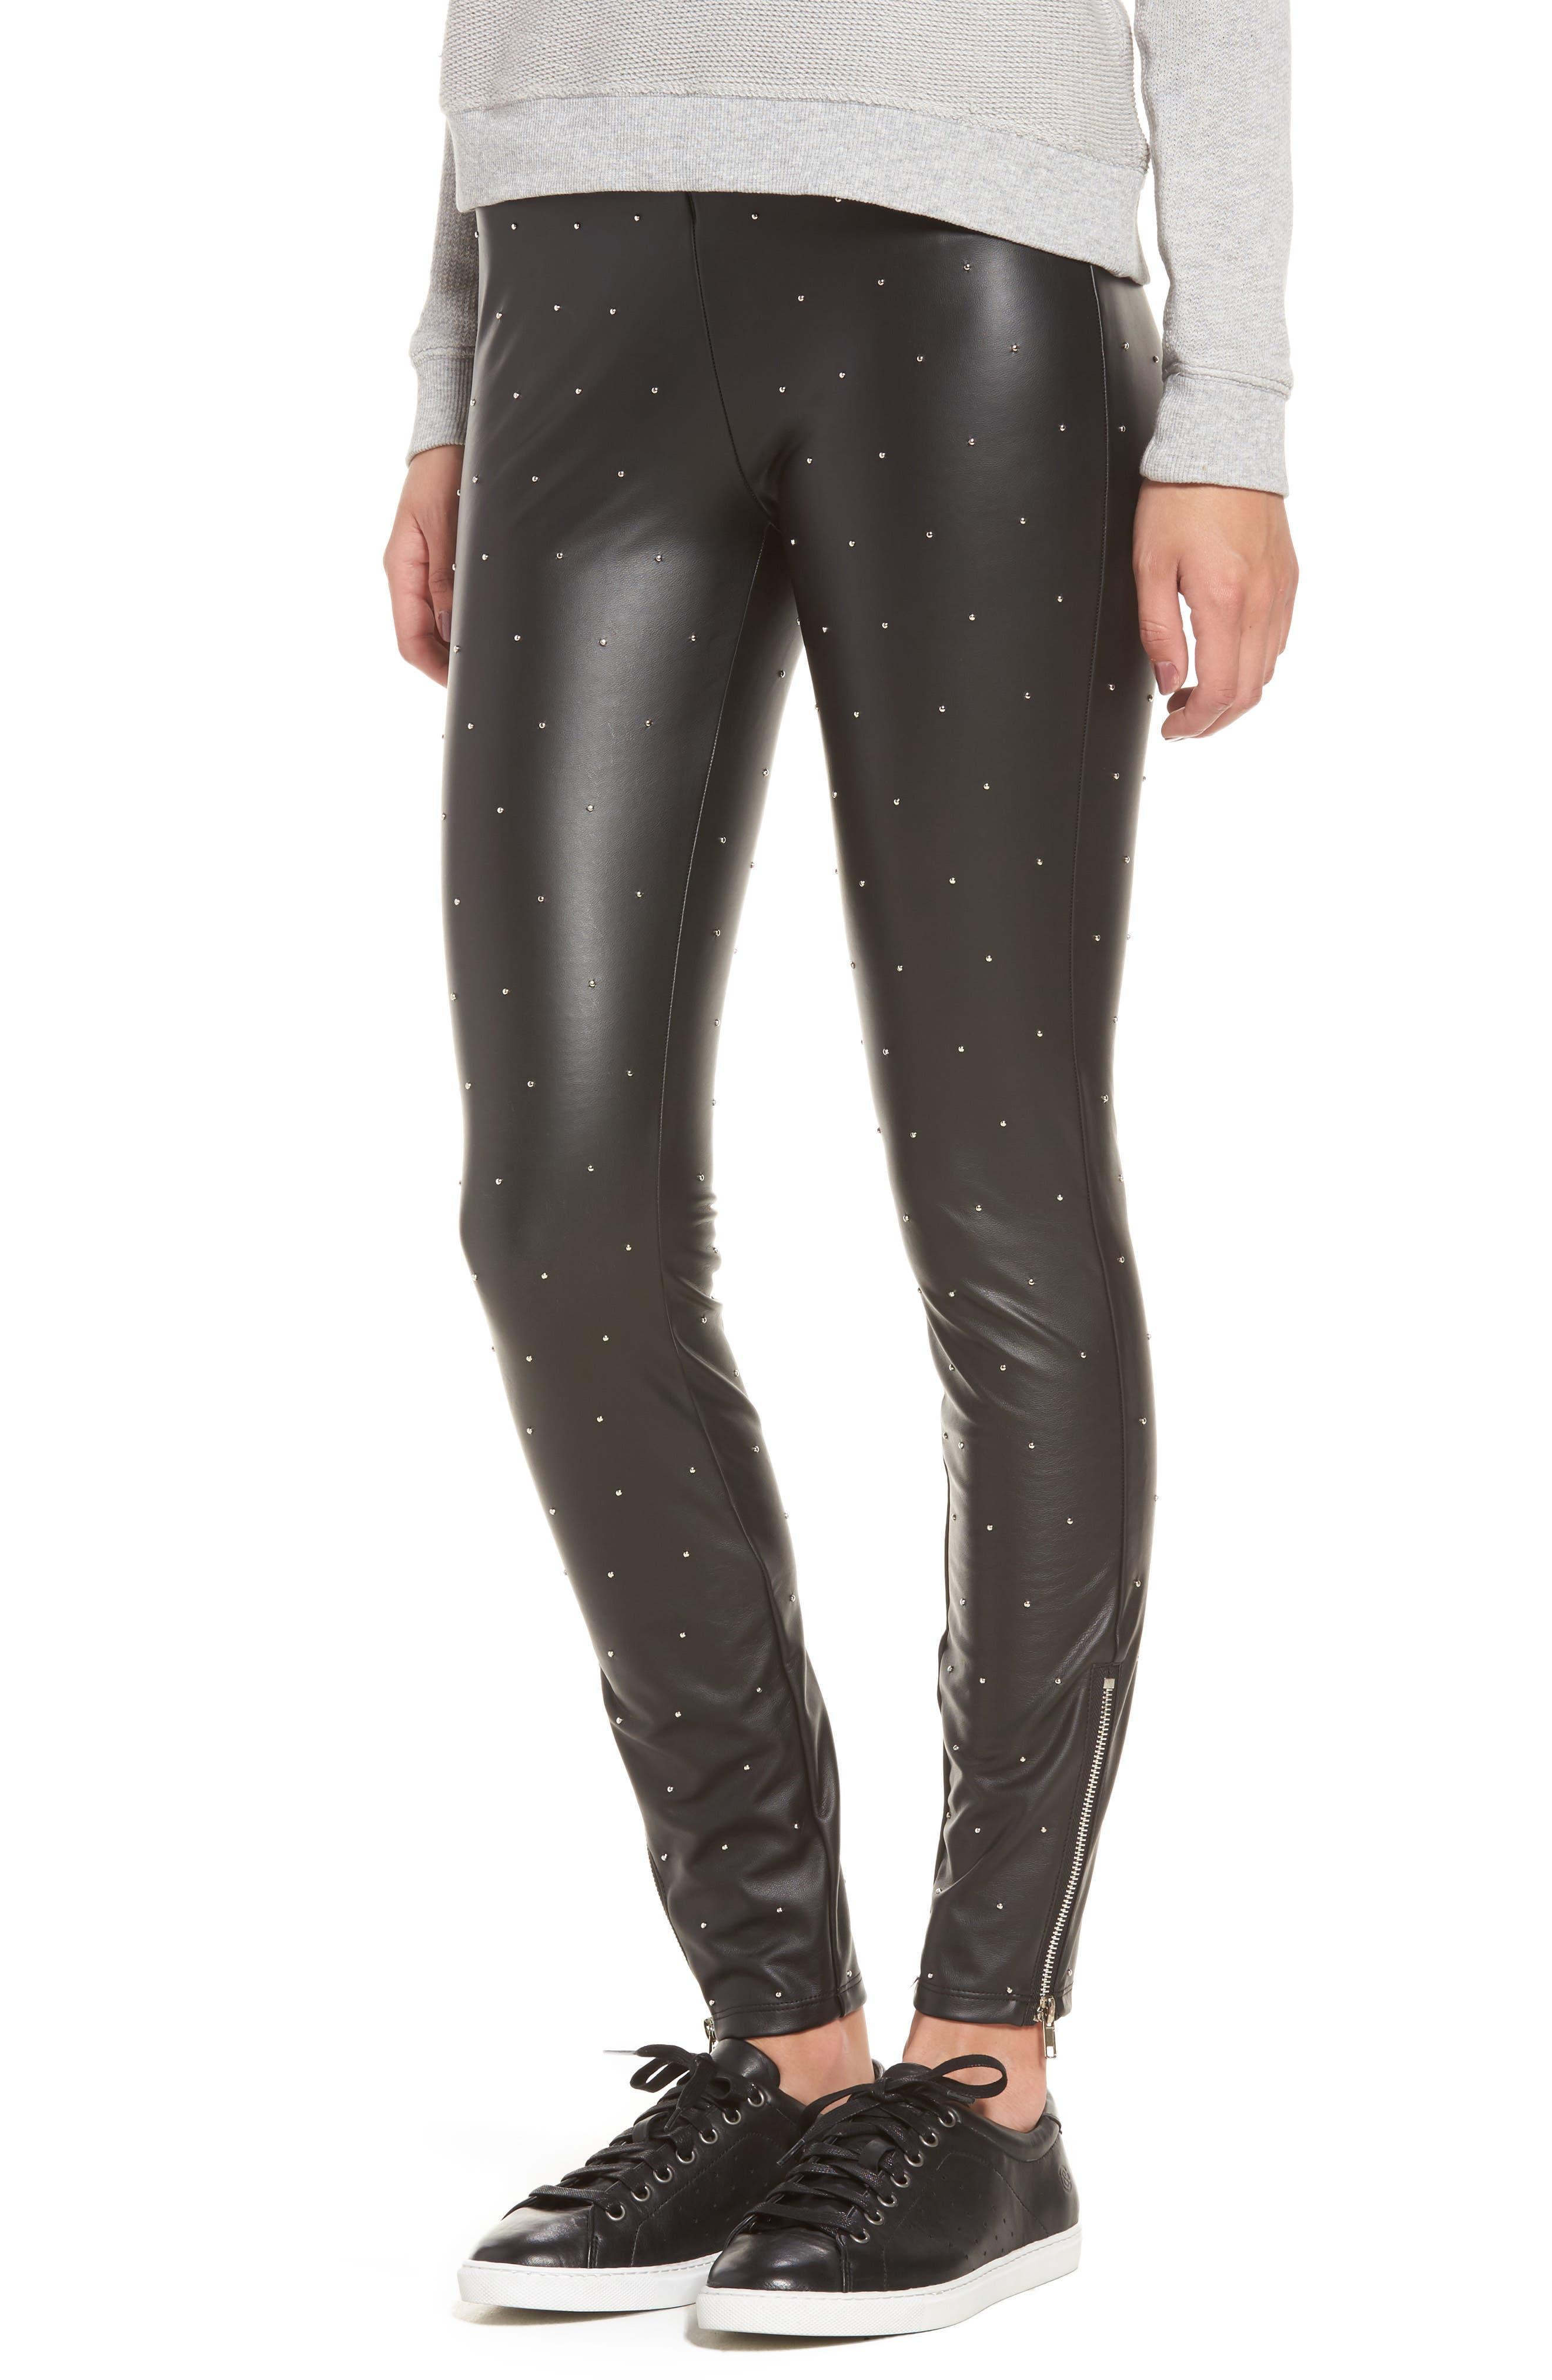 Bowery Studded High Waist Leggings,                         Main,                         color, Silver Dot